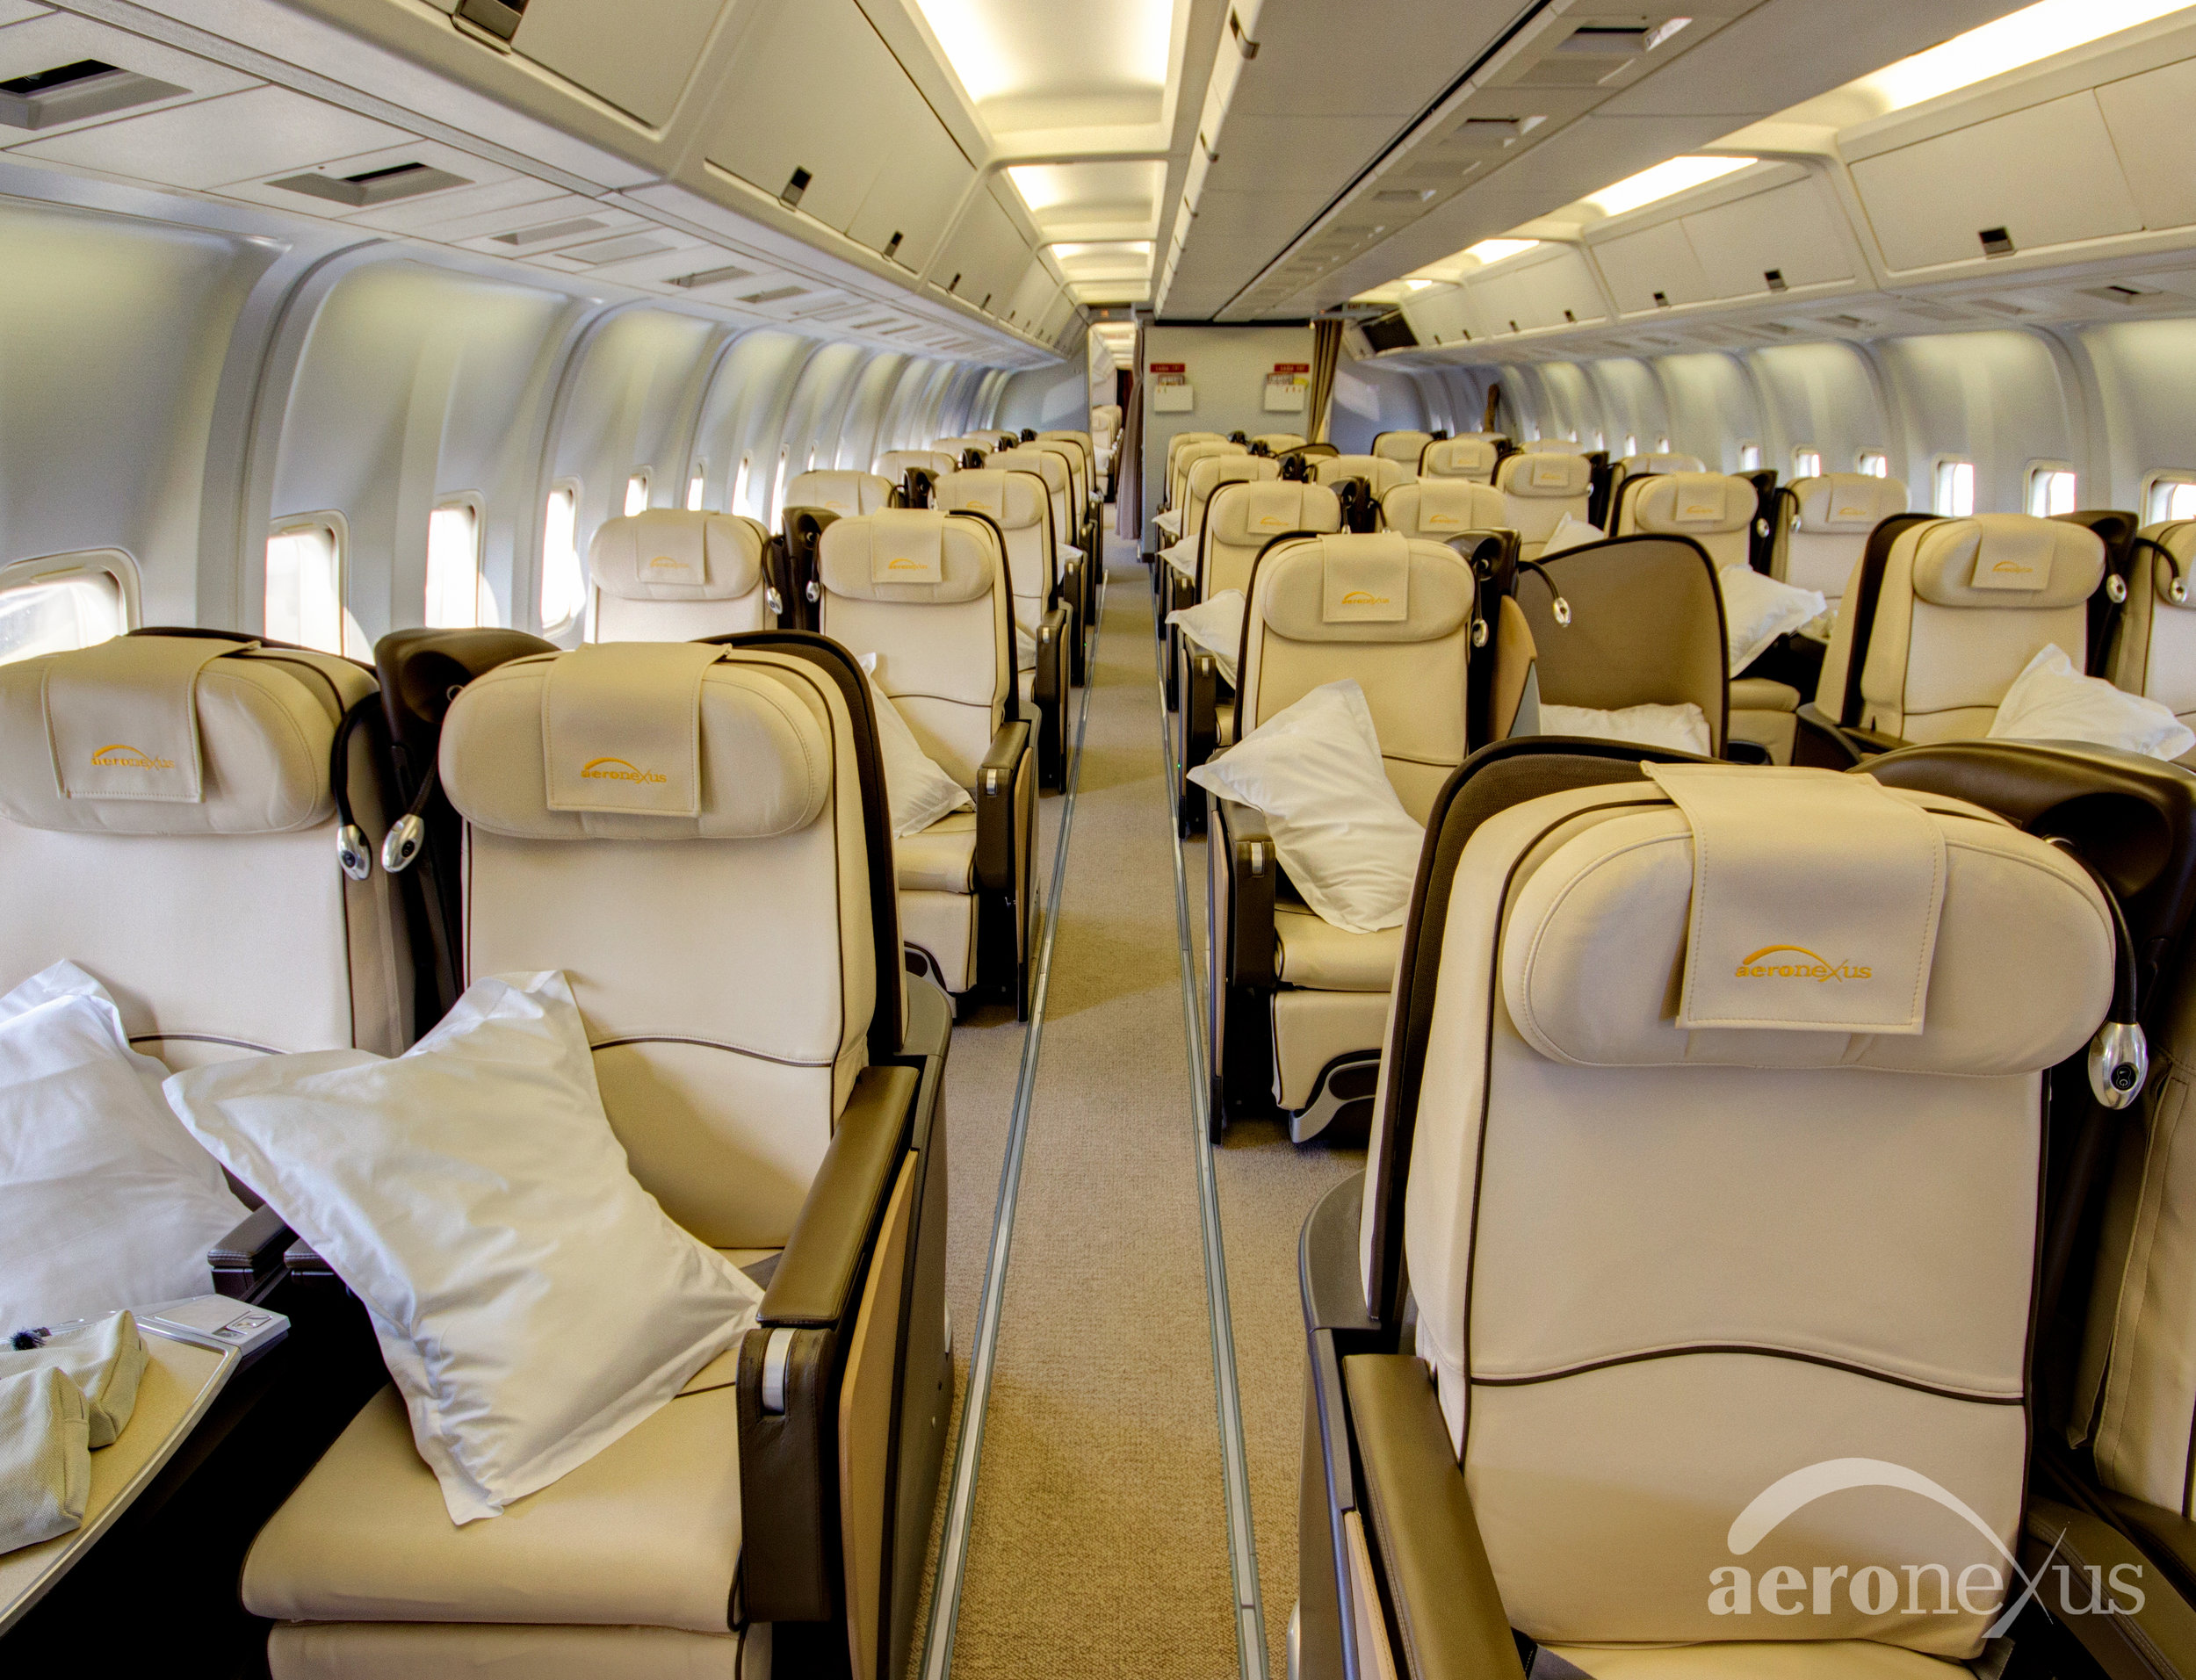 Aeronexus | VIP Boeing 767-300ER | Interior Seating